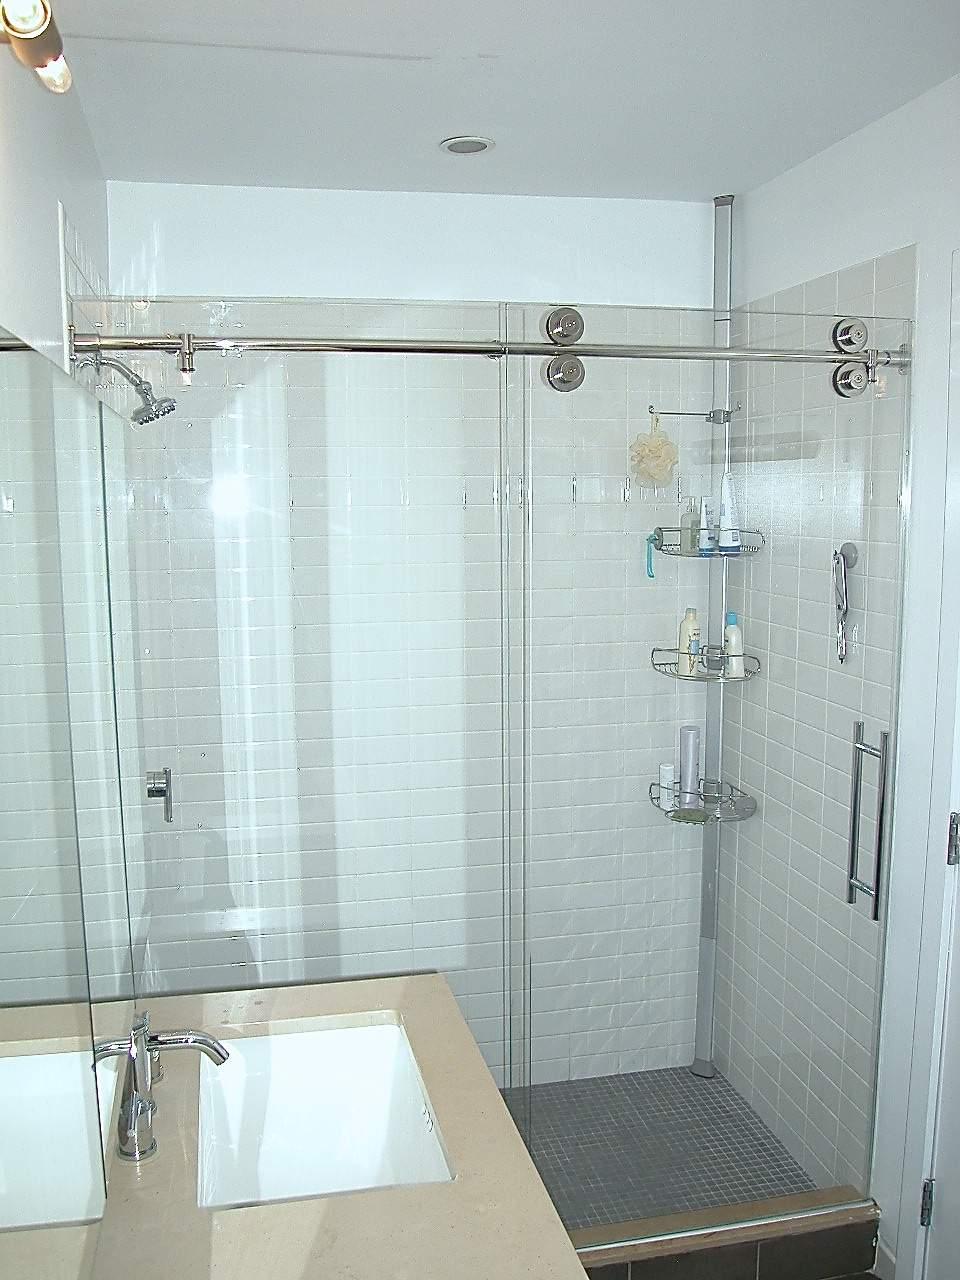 Manhattan Shower Door - womenofpower.info